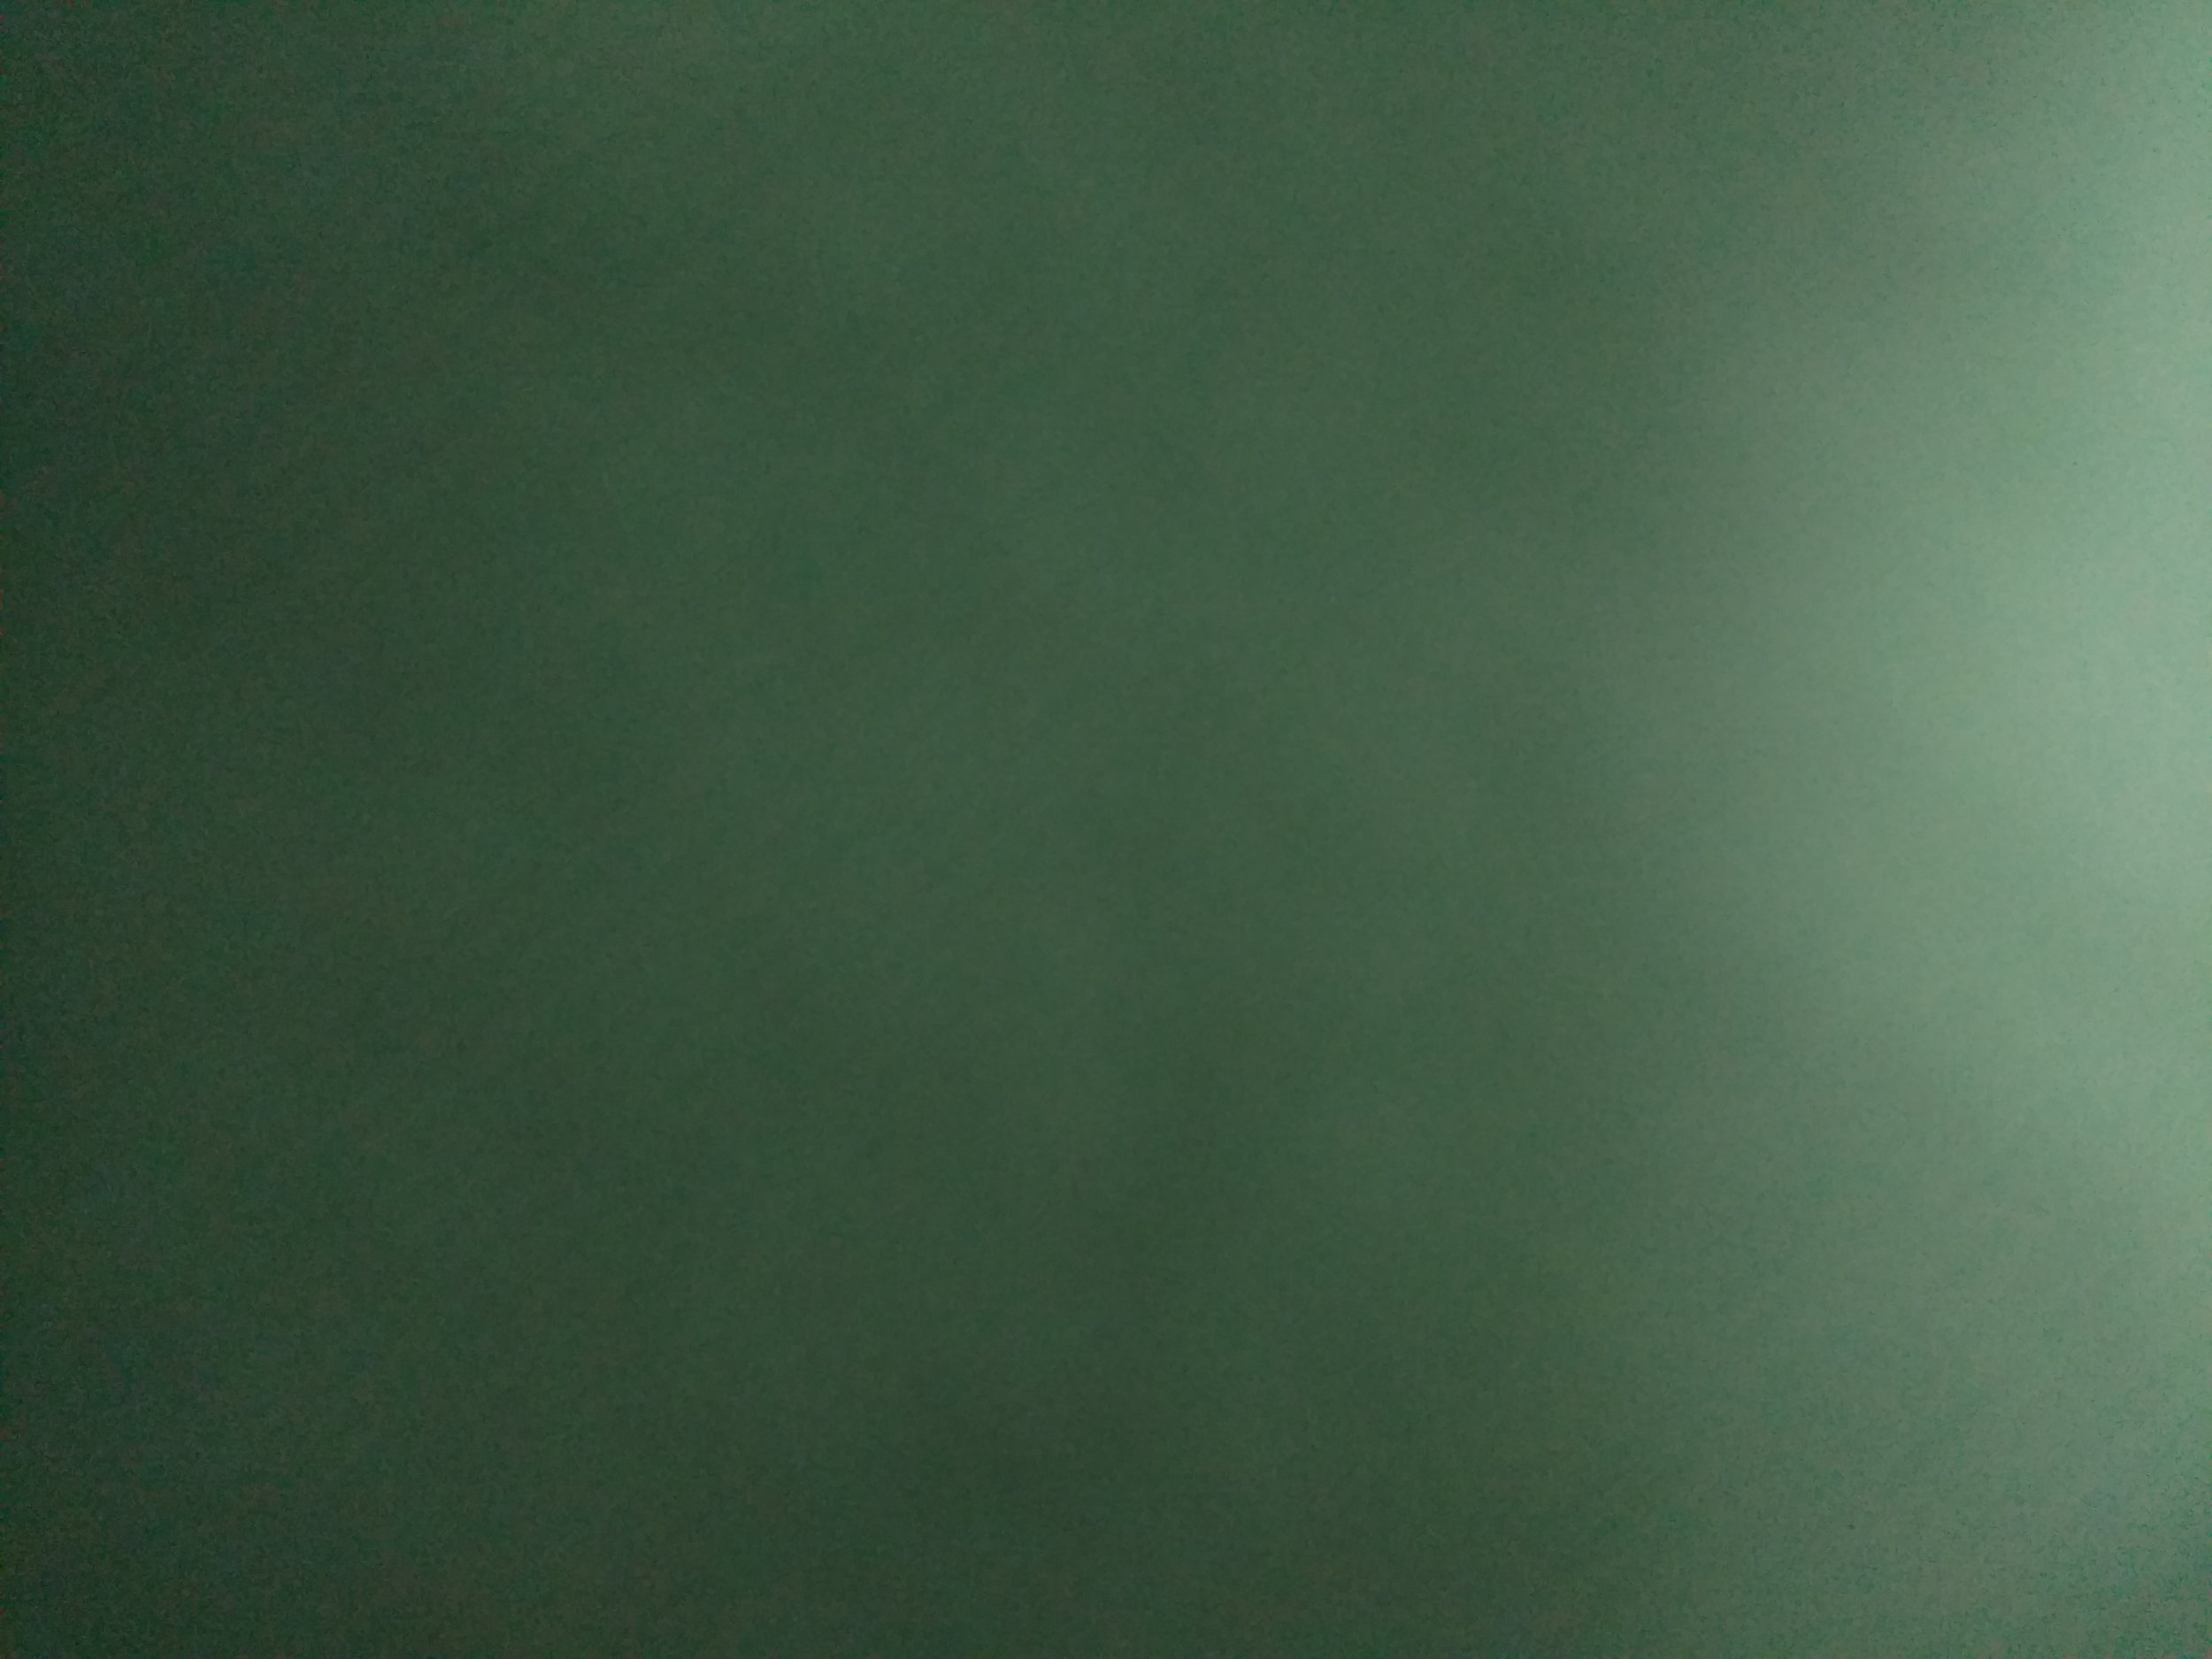 willroth-co-free-texture-gradient-040.jpg